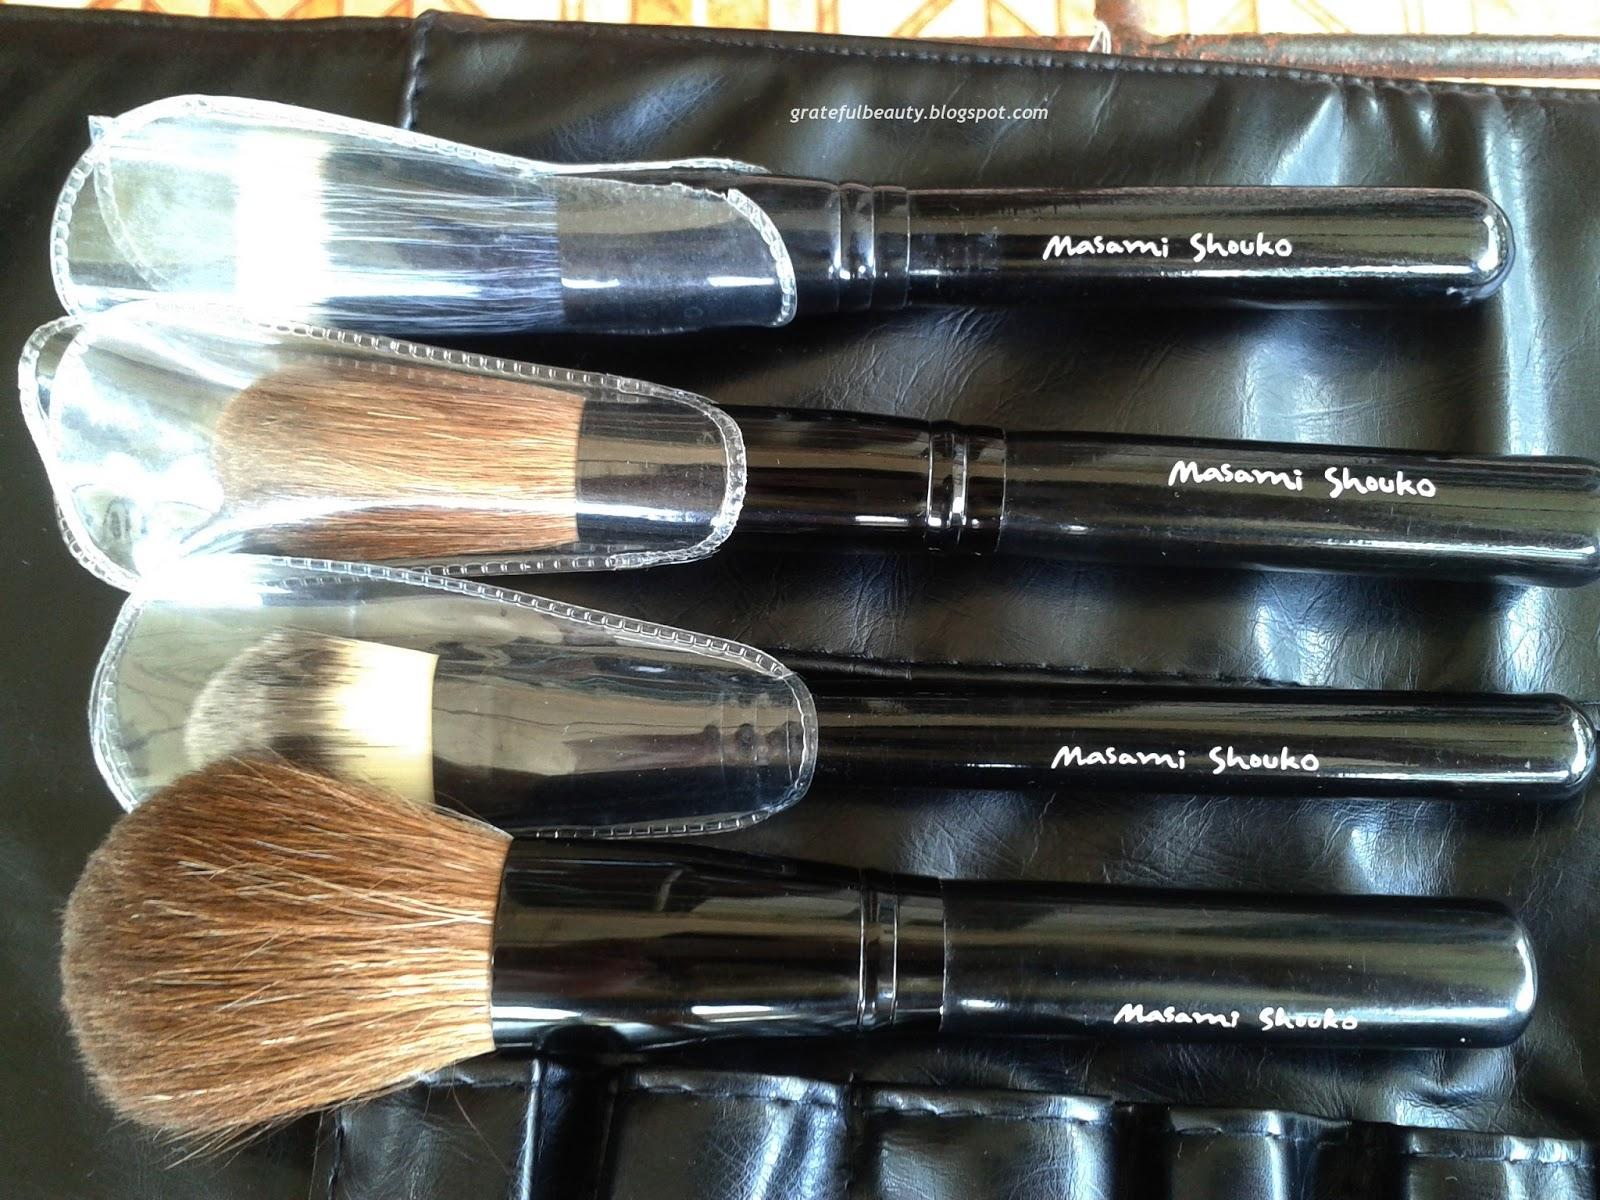 Good Brush Makeup Kornelia Luciana Kuas Lembut Make Up Brushnya Sekali Tidak Membuat Sakit Ketika Mengaplikasikan Dan Memiliki Pegangan Yang Kuat Paling Penting Dalam Memilih